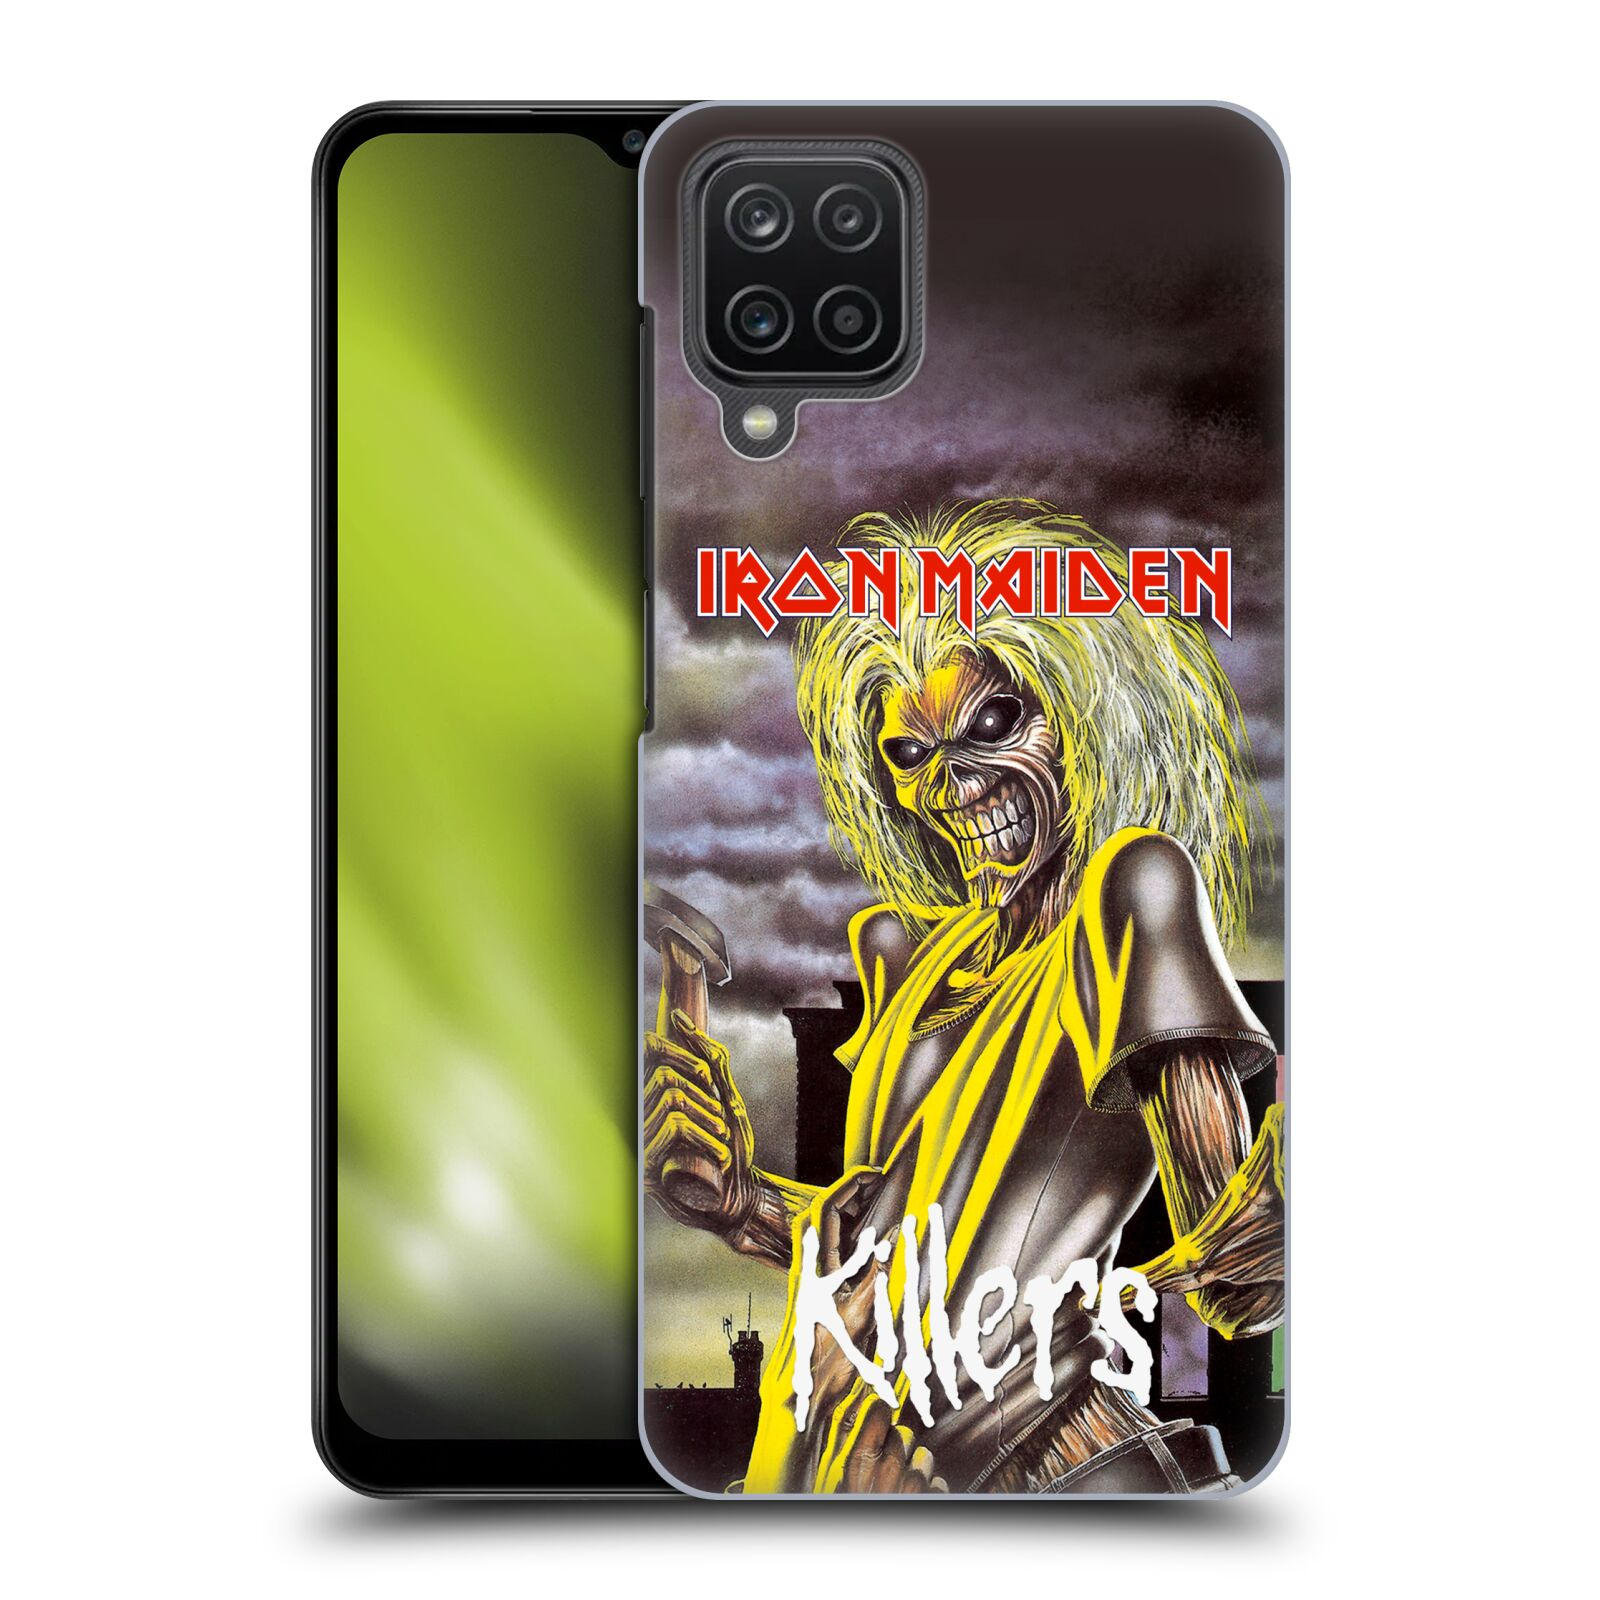 Plastové pouzdro na mobil Samsung Galaxy A12 - Head Case - Iron Maiden - Killers